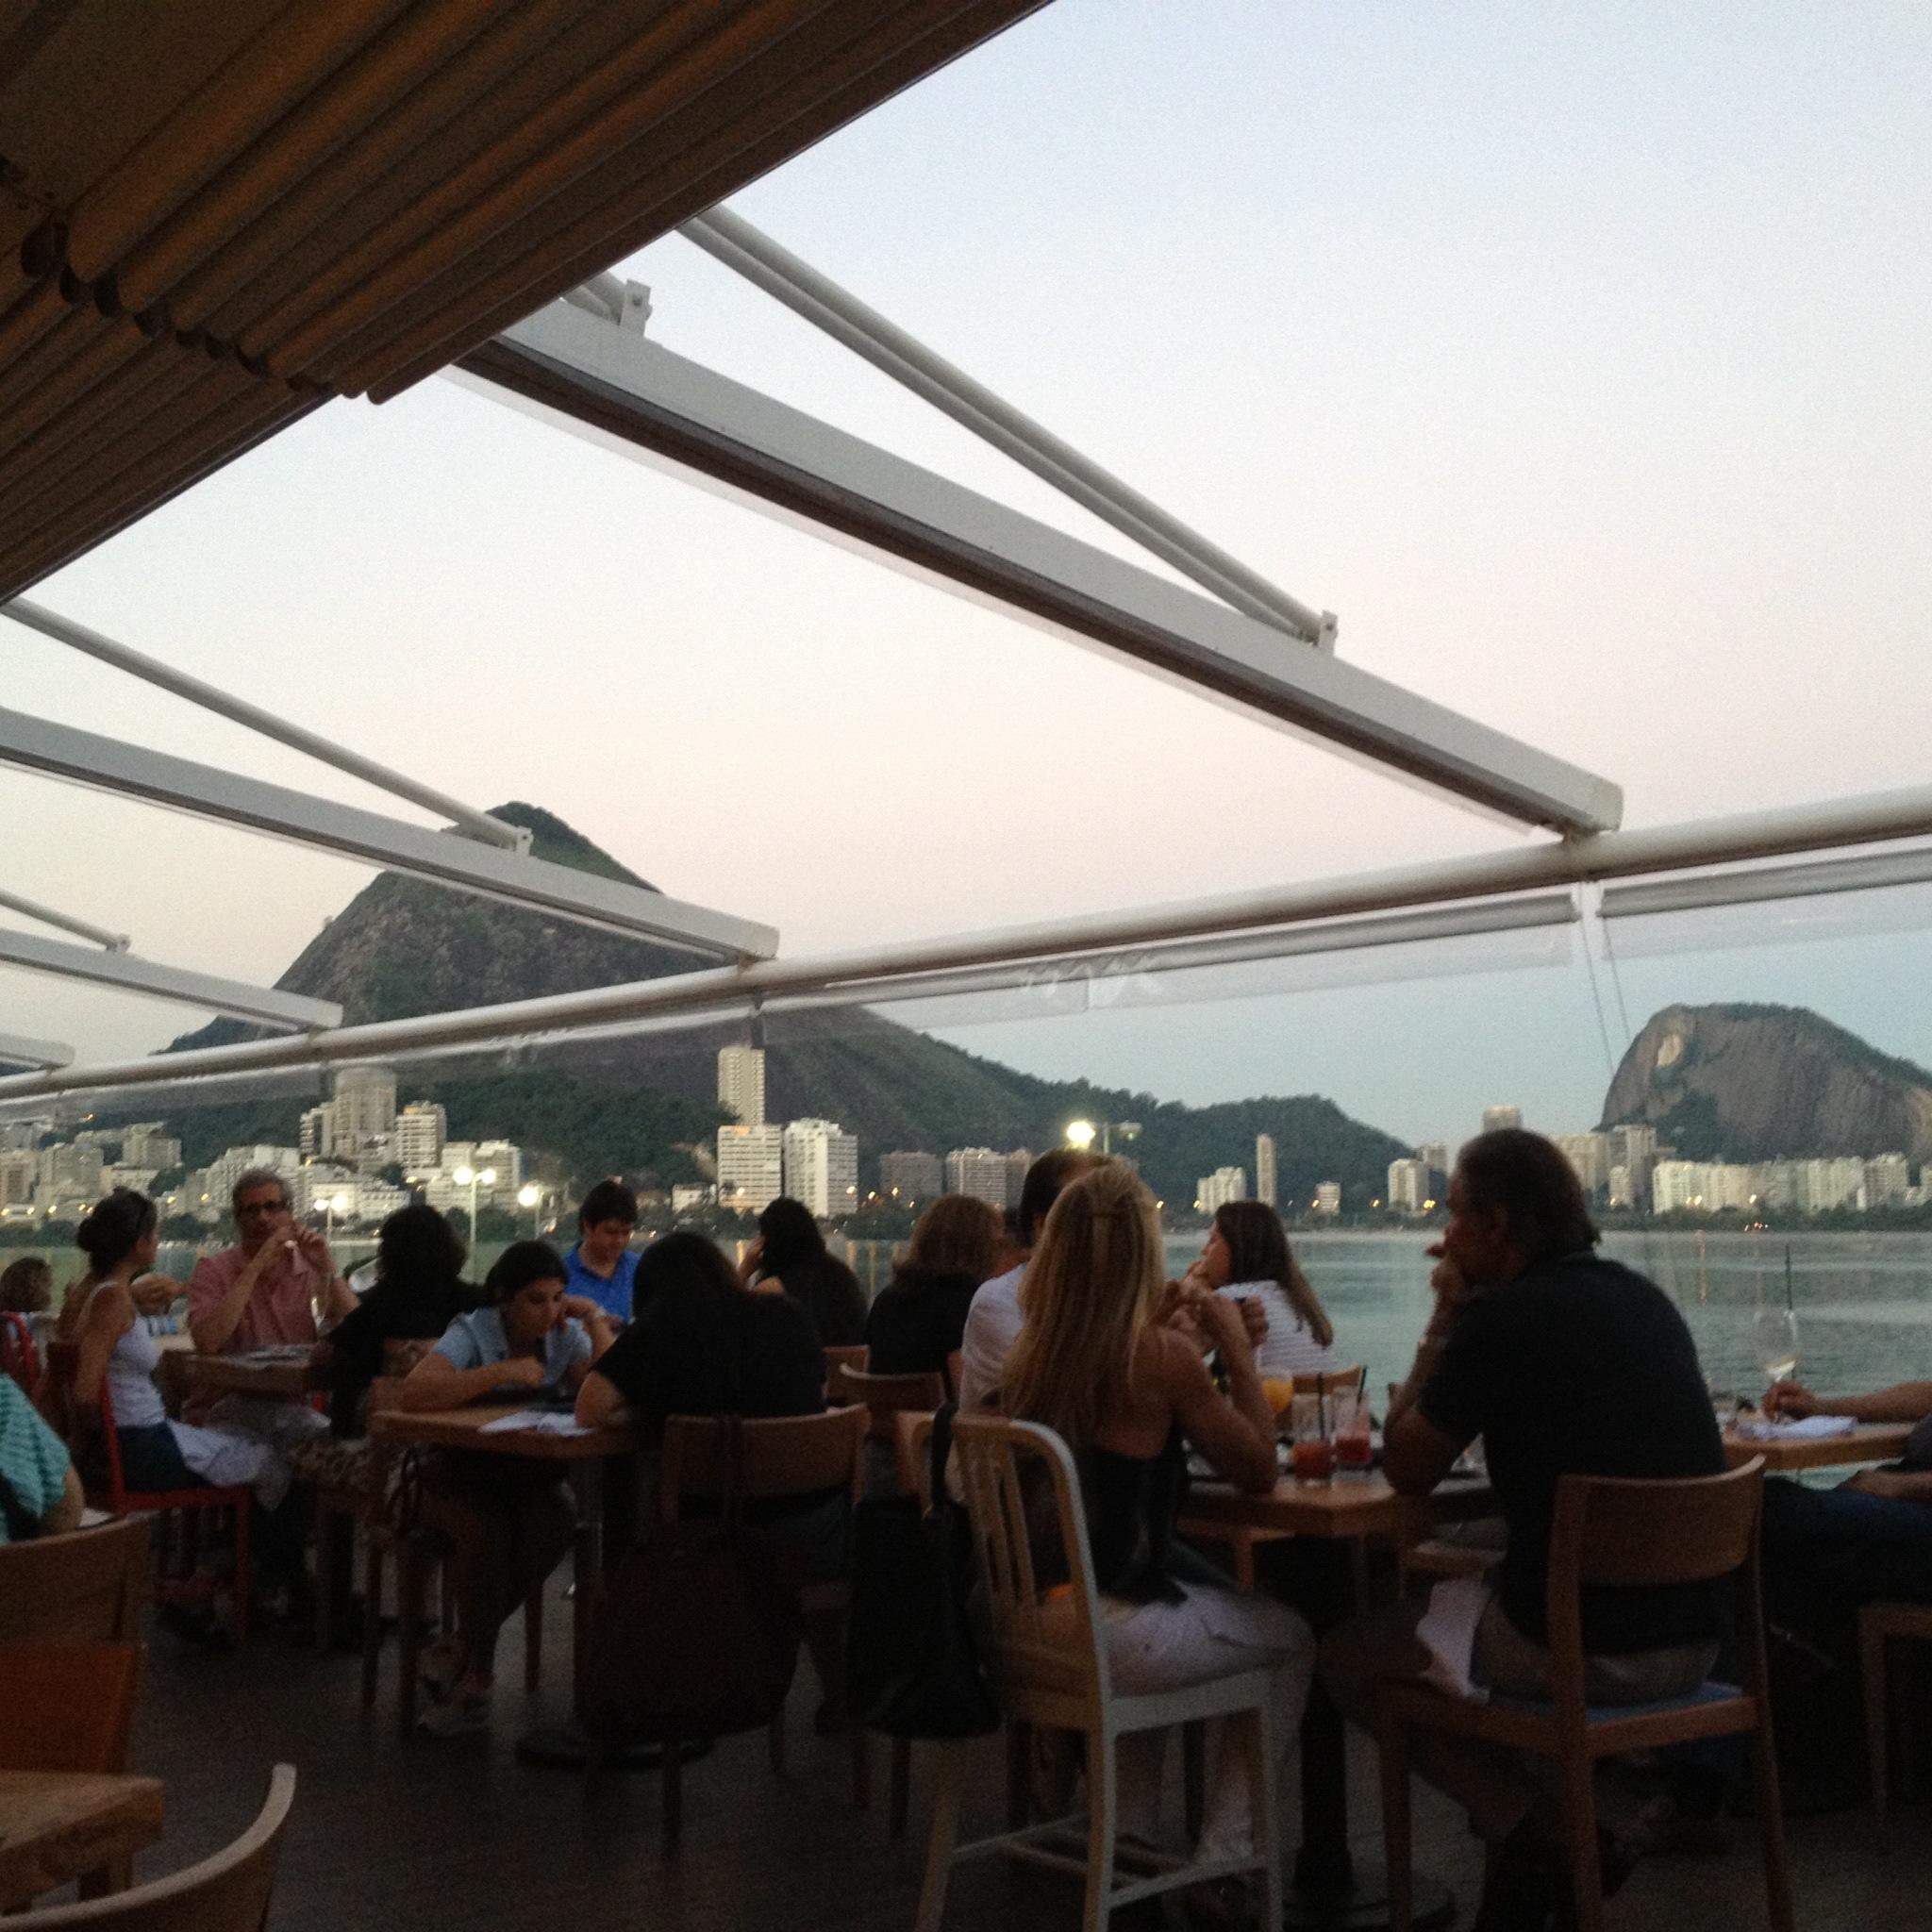 Lagoon-Gourmet-Restaurante-Rio-Dica-de-gastronomia-blog-da-lari-lari-duarte-.com